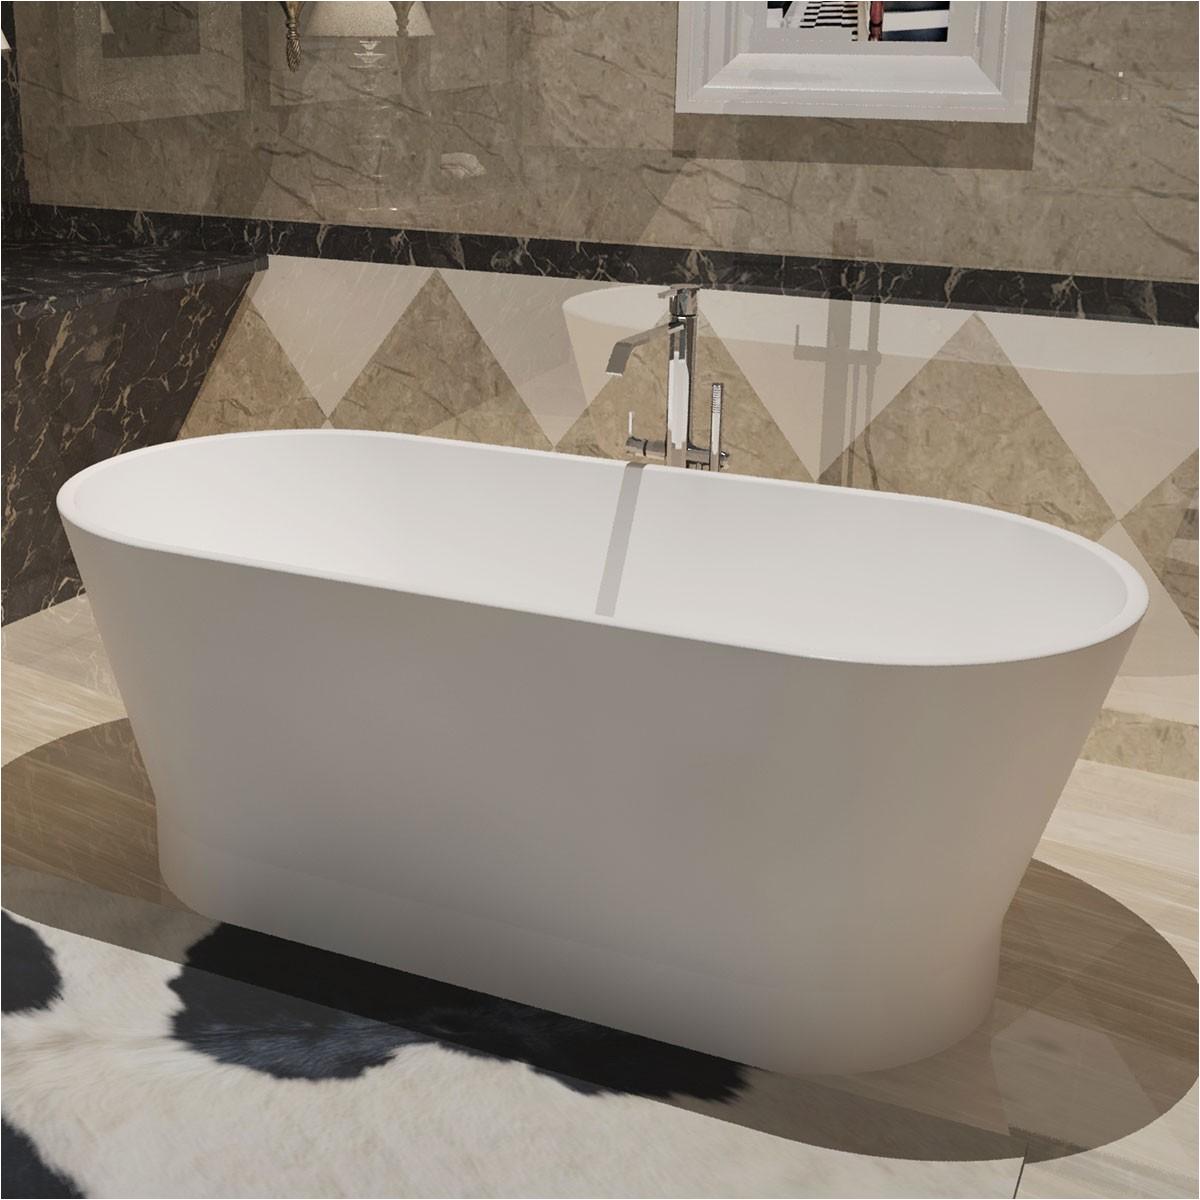 Matte White Freestanding Bathtub 59 In Oval Man Made Stone Freestanding Bathtub Matte